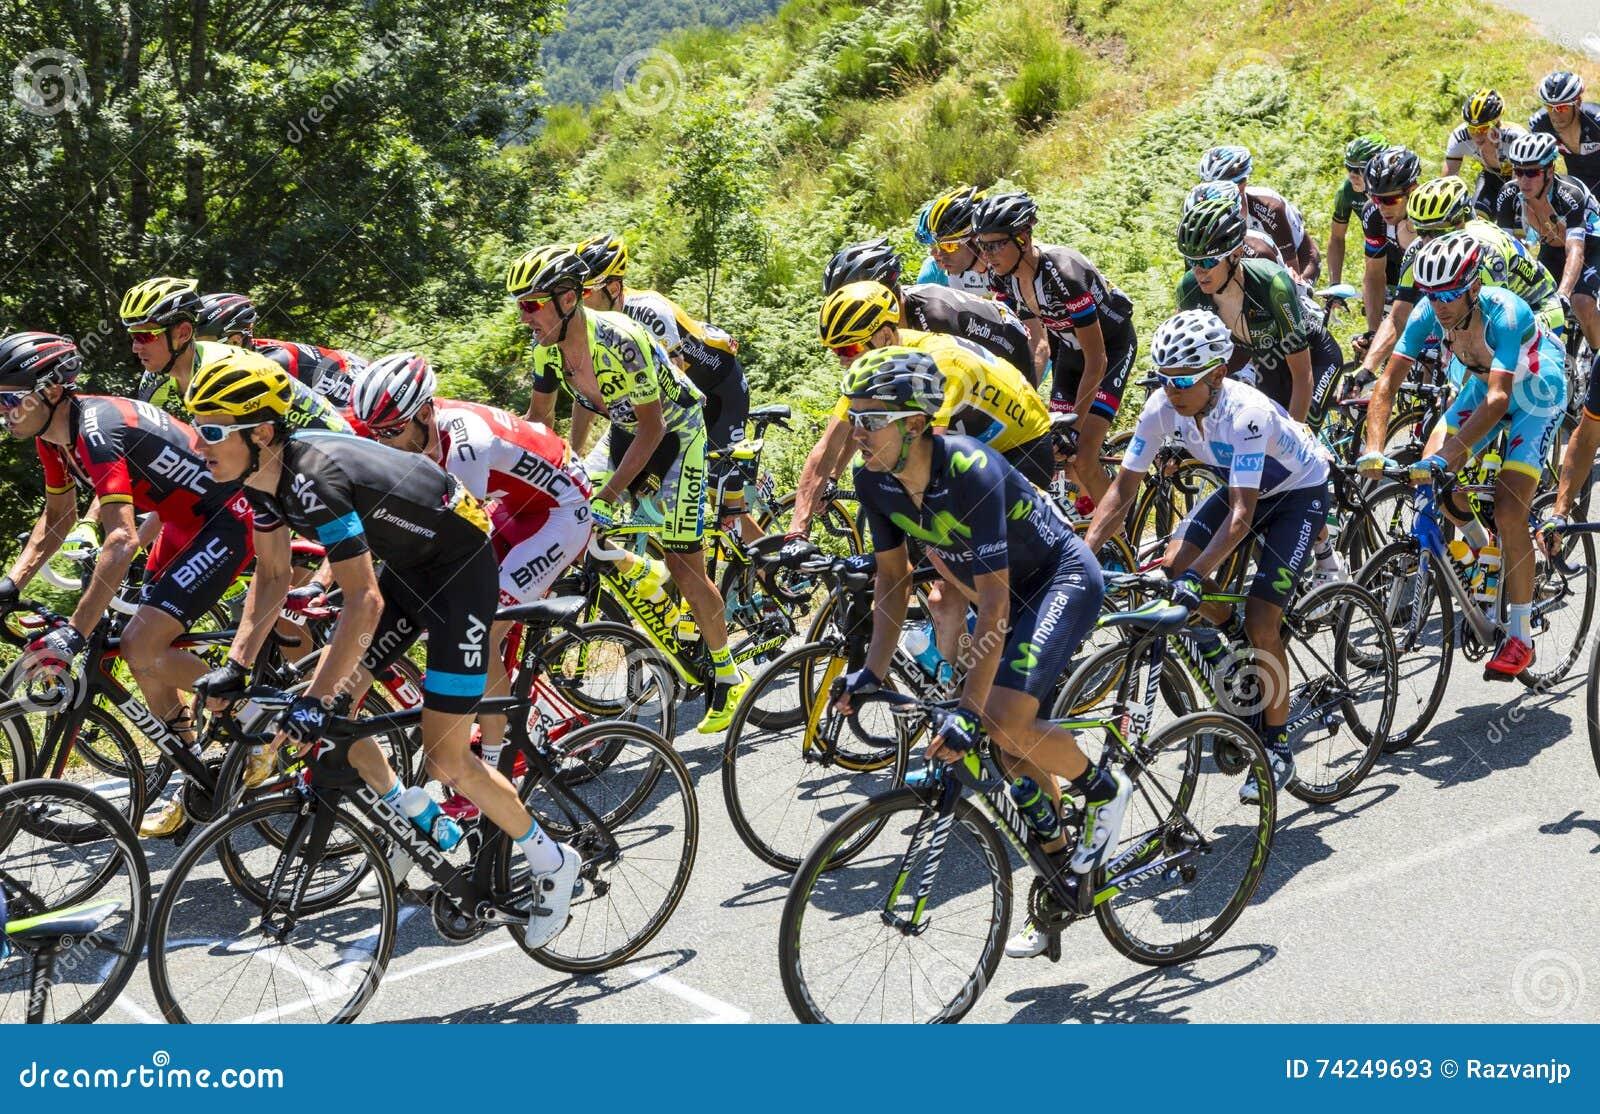 cd5d6d090 The Fight Inside The Peloton Tour De France 2015 Editorial Stock Photo  Image  74249693